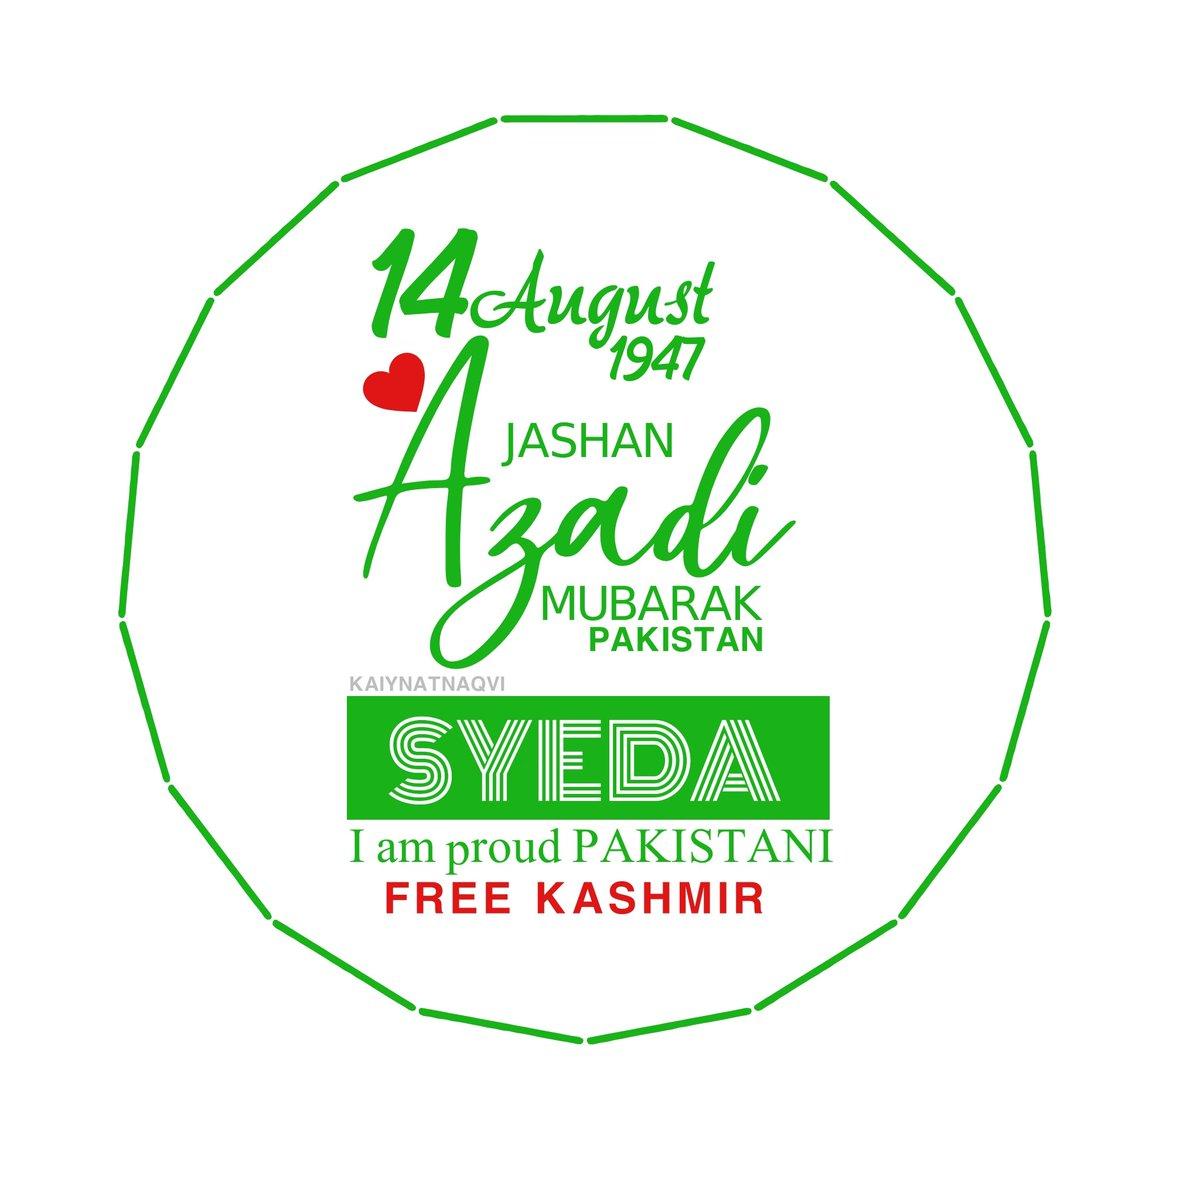 Yu di hmen azaadi k Dunia hui Hairan Ay QUAID E AZAM Tera ehsan hy tera ehsan😍💚 #PakistanZindabad  #Pakistan  #IndependenceDay https://t.co/bgqNJyOa9y